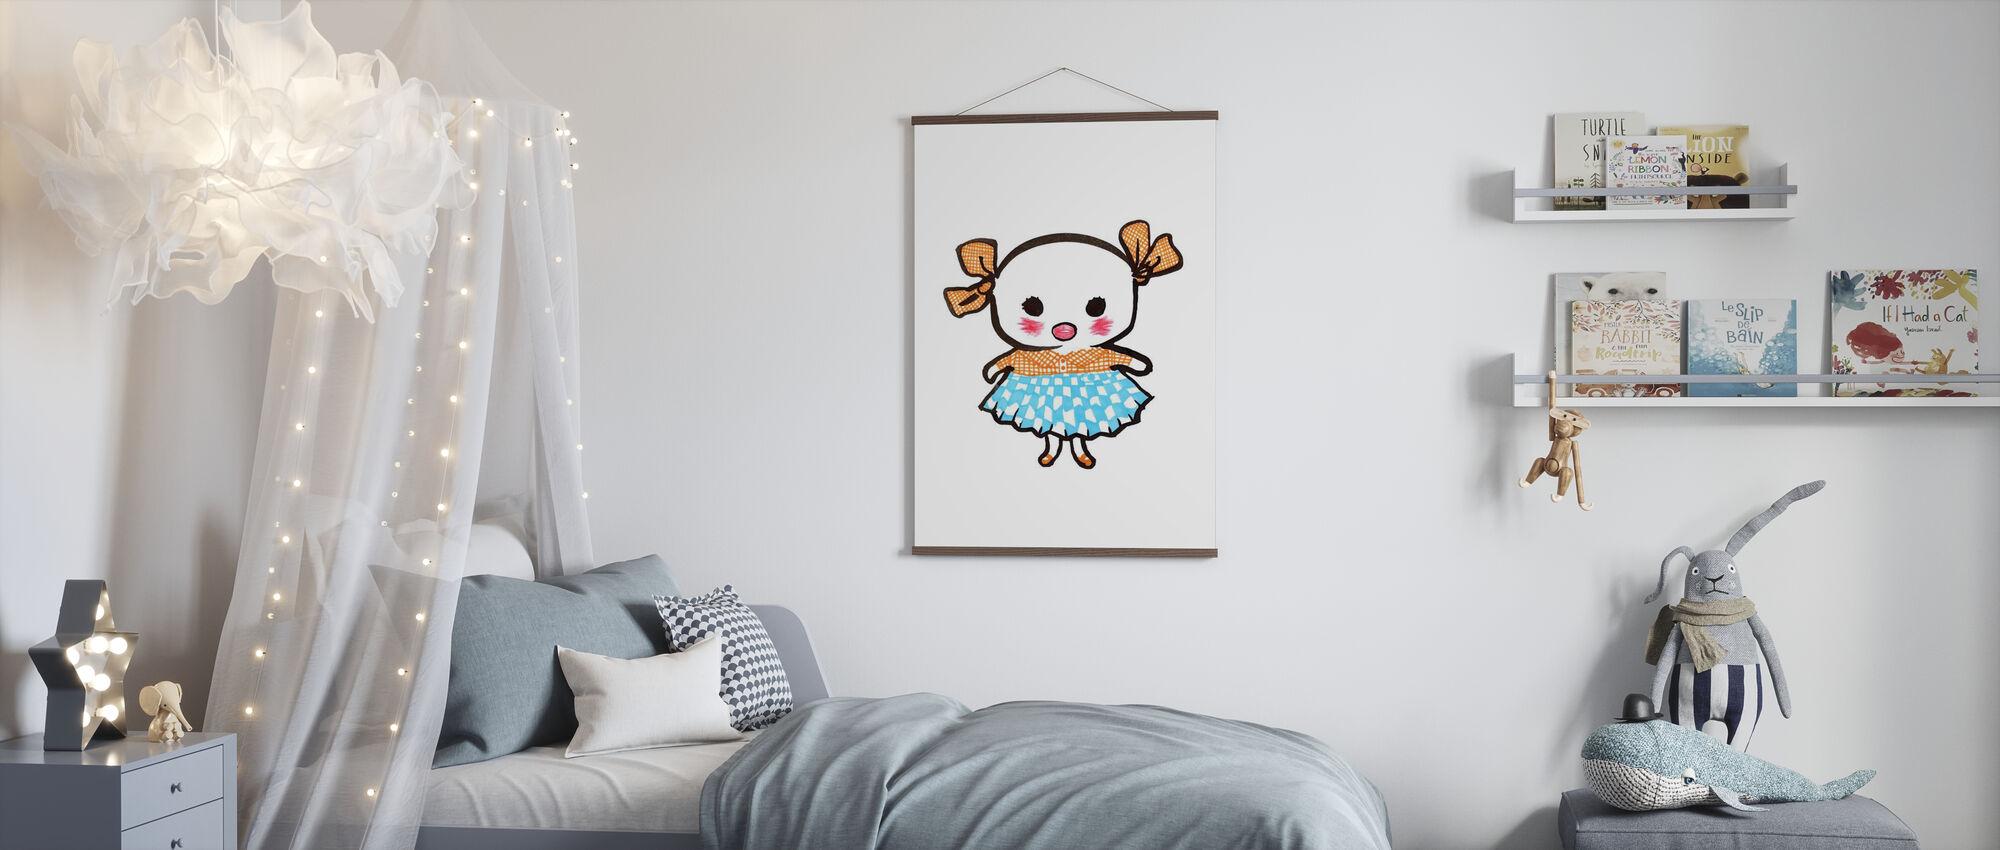 Lill-Stina - Poster - Kids Room